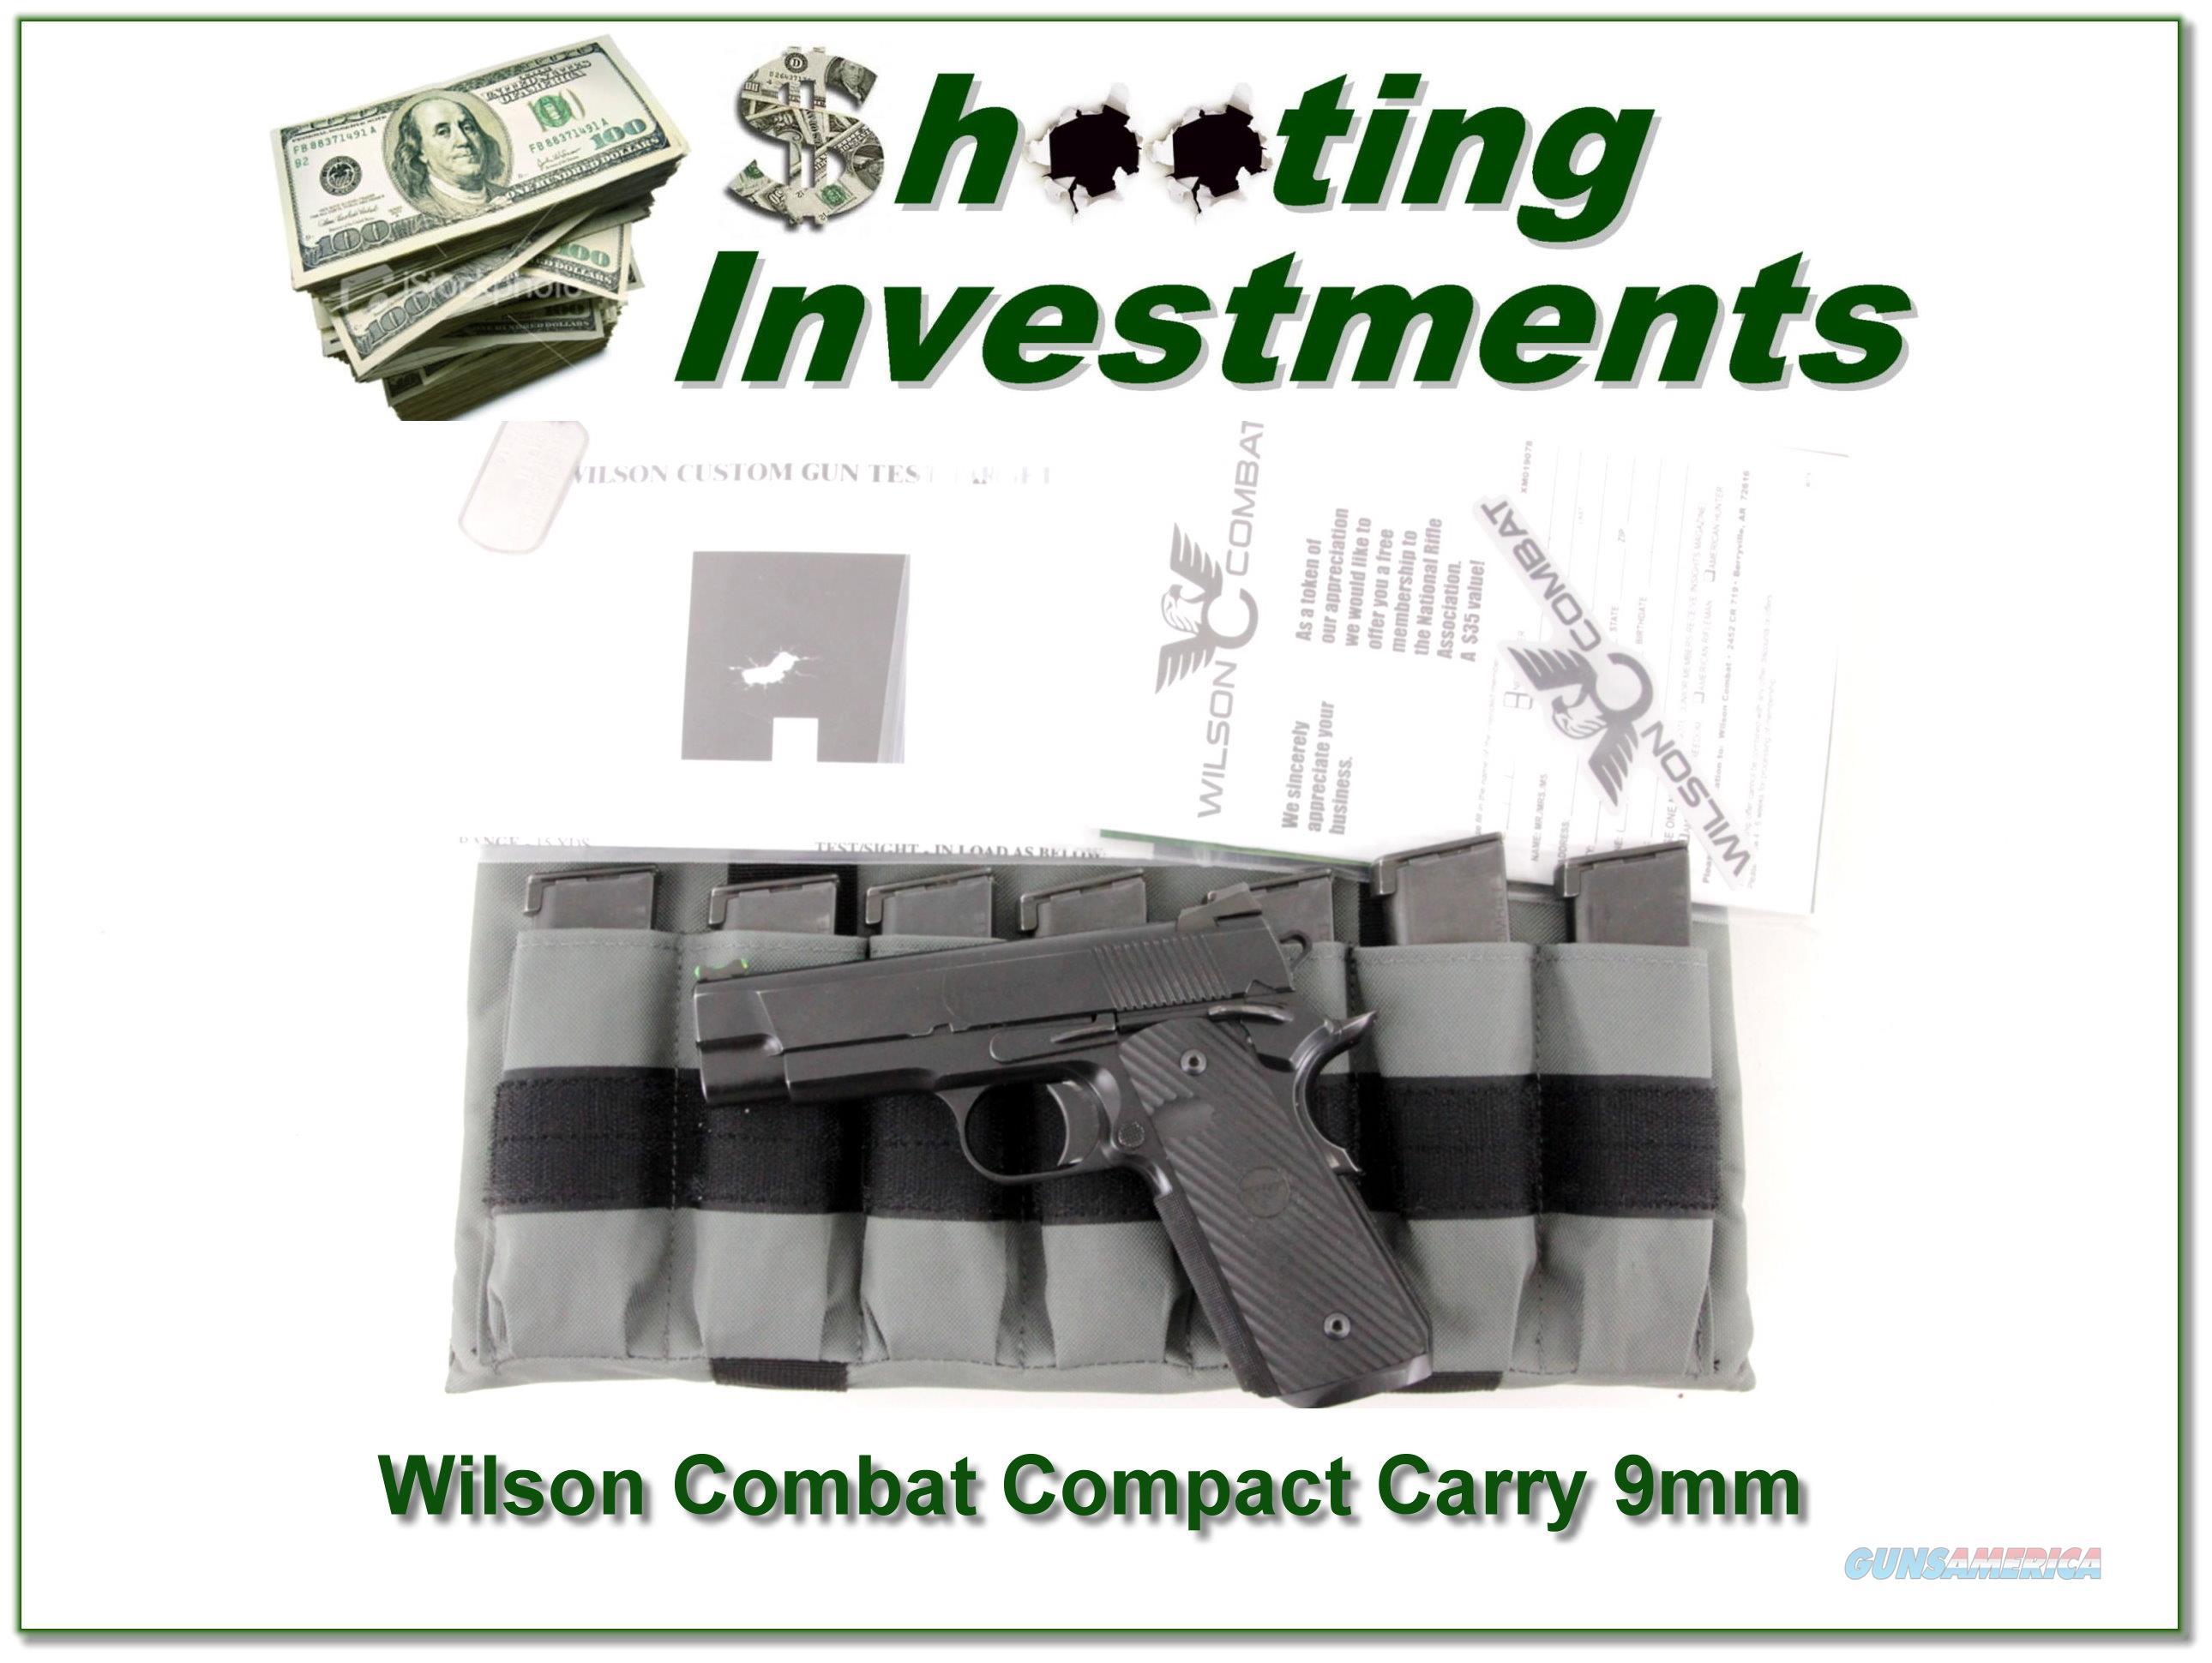 Wilson Compact Compact Carry 9mm 10 Magazines  Guns > Pistols > Wilson Combat Pistols